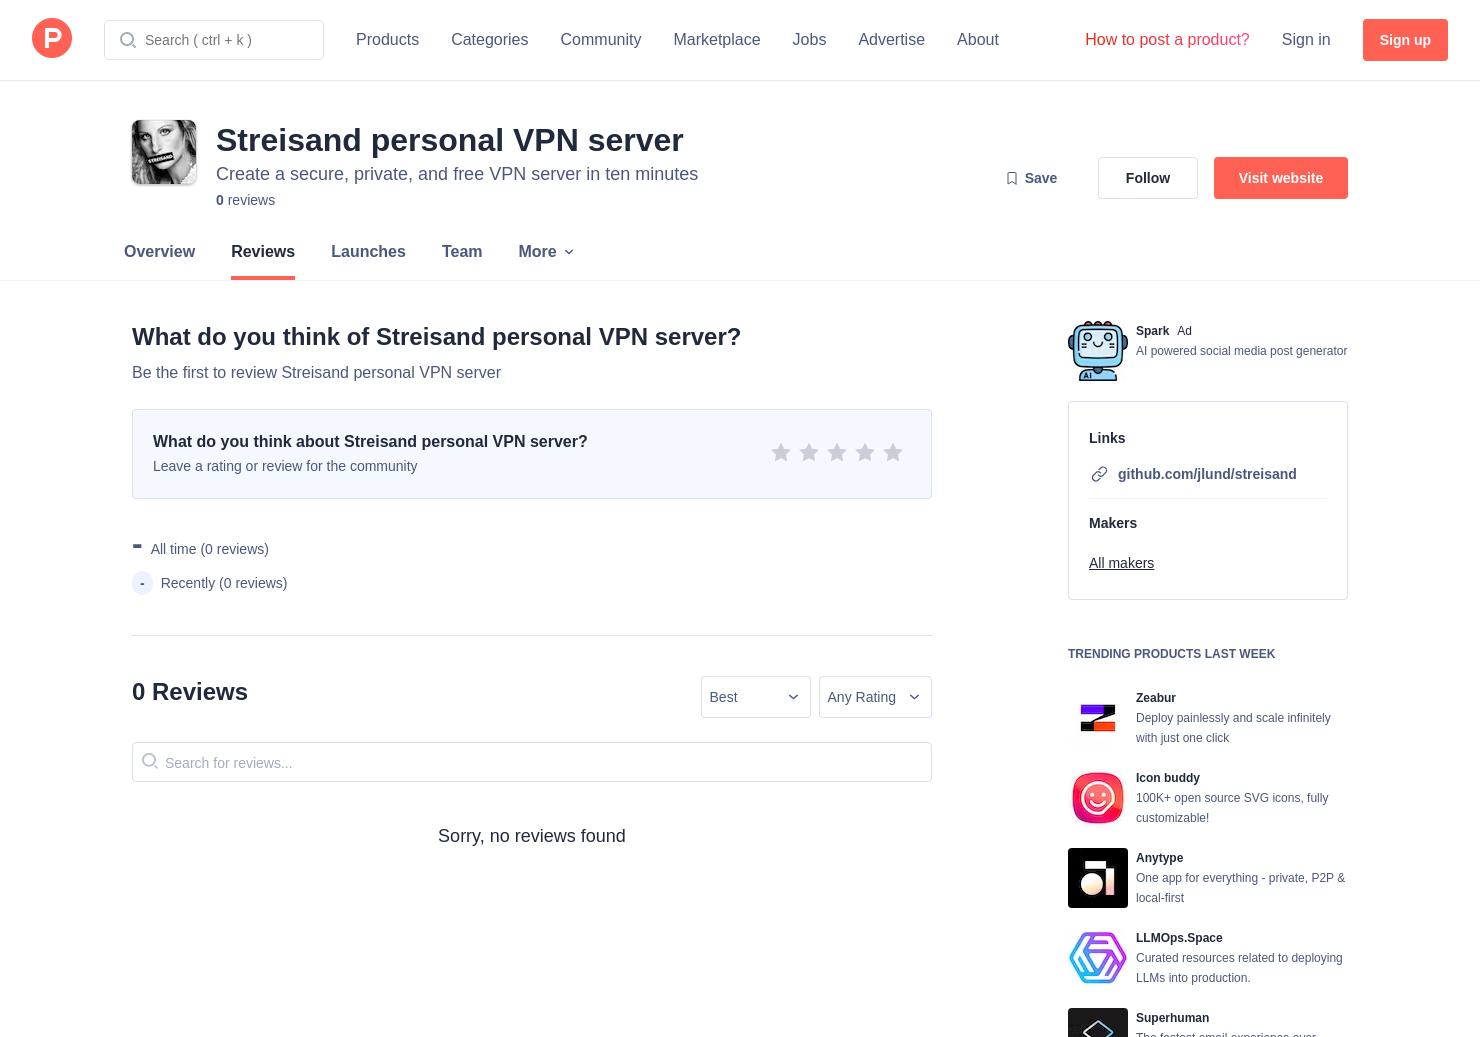 Streisand personal VPN server Reviews - Pros, Cons and